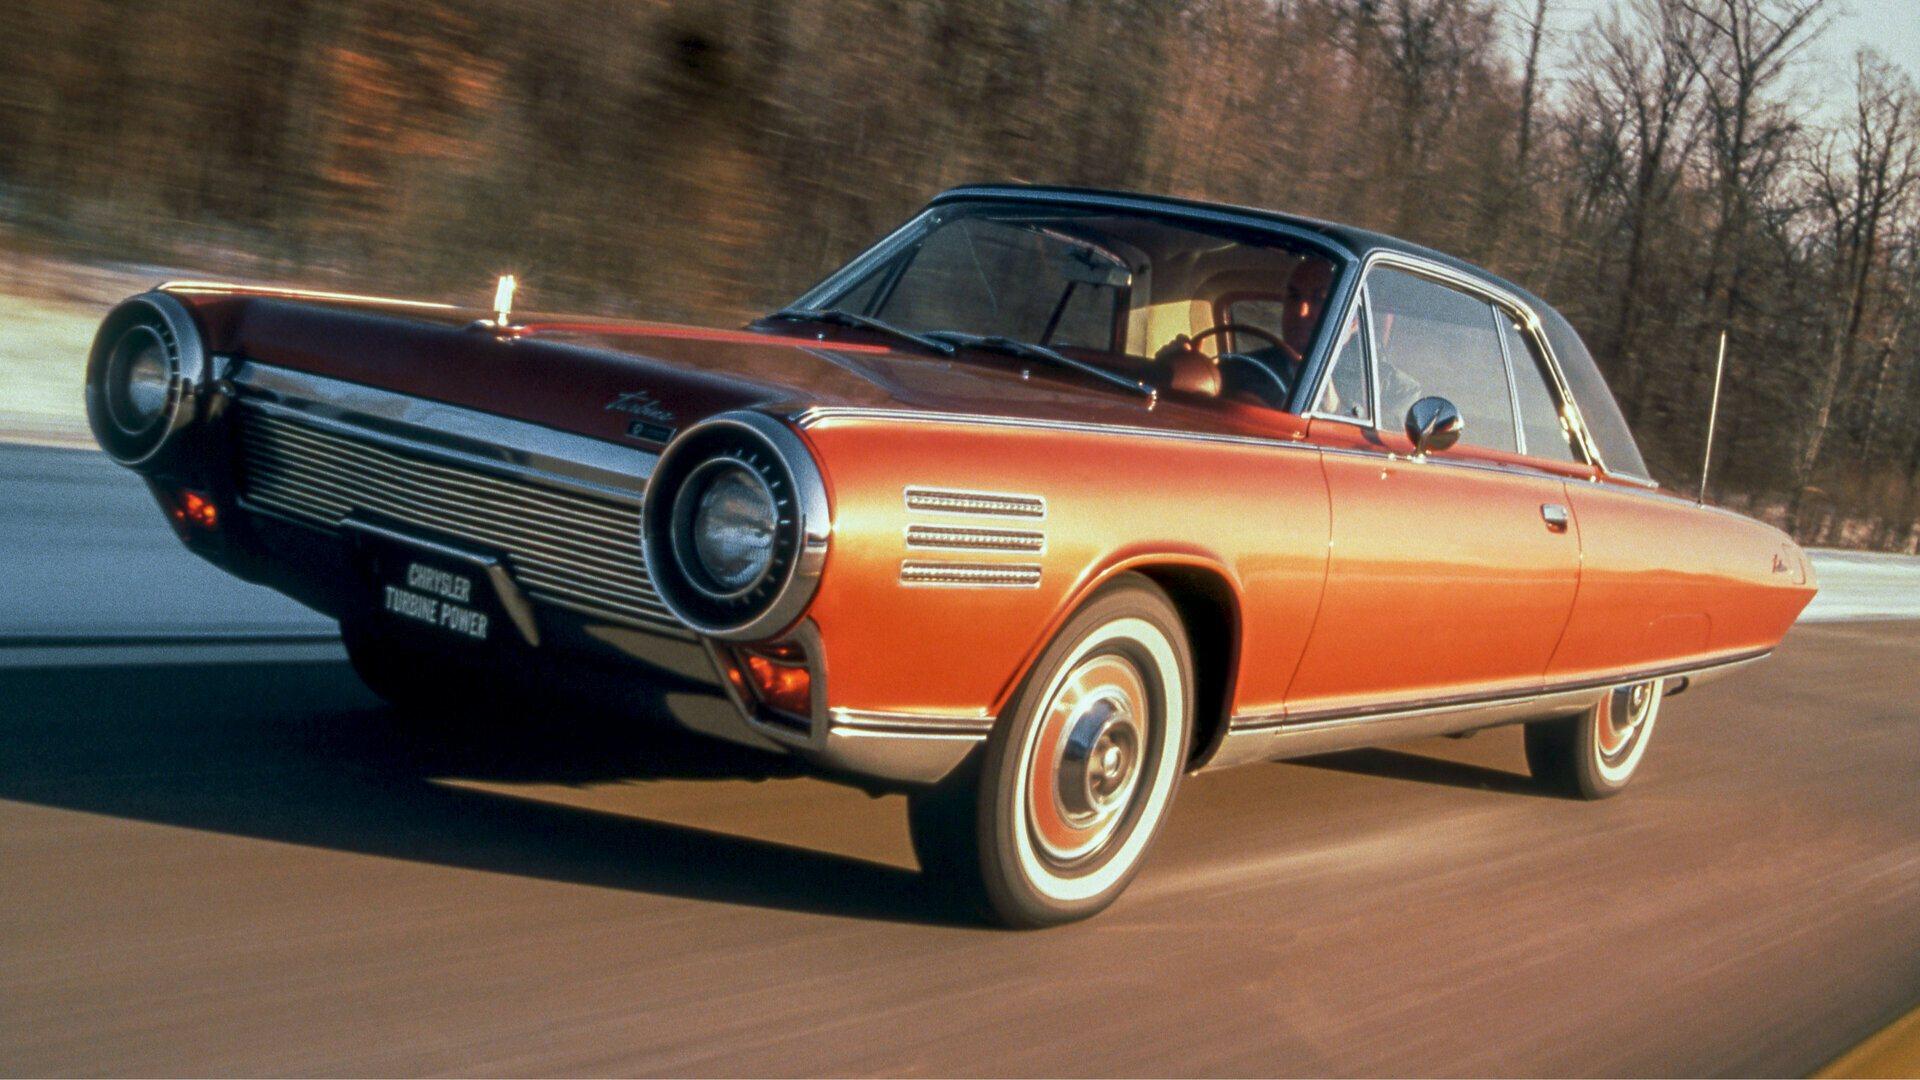 Coche del día: Chrysler Turbine Car